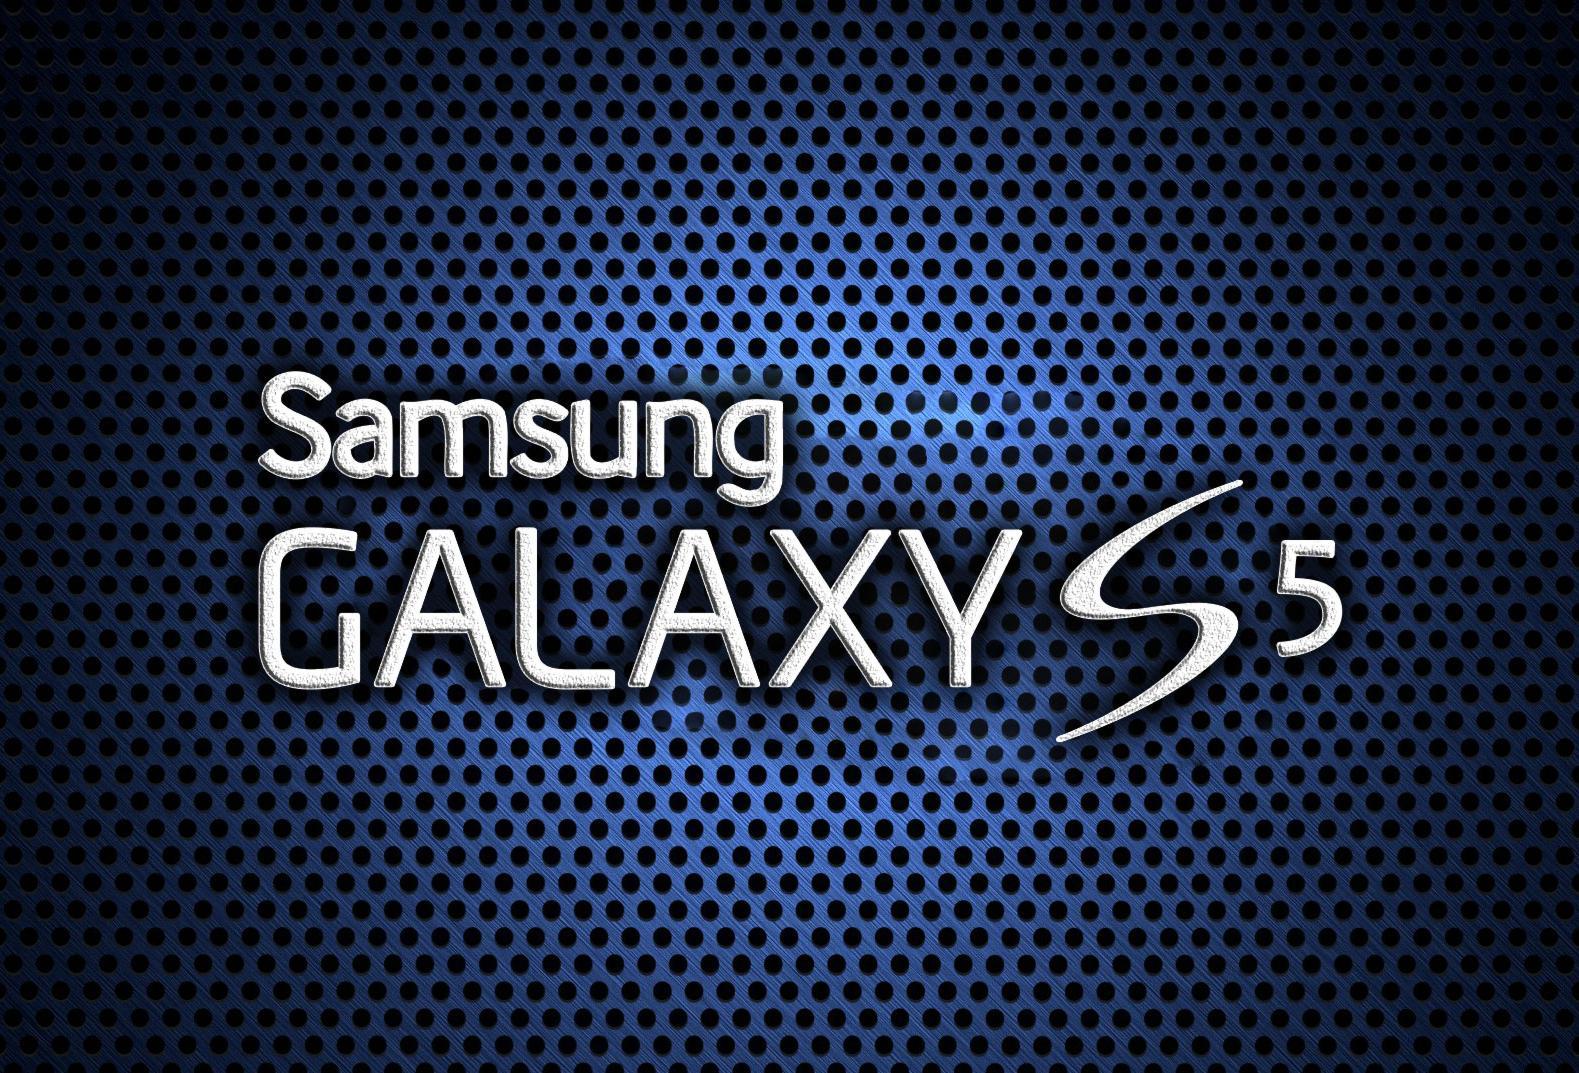 Samsung-Galaxy-S5-Logo